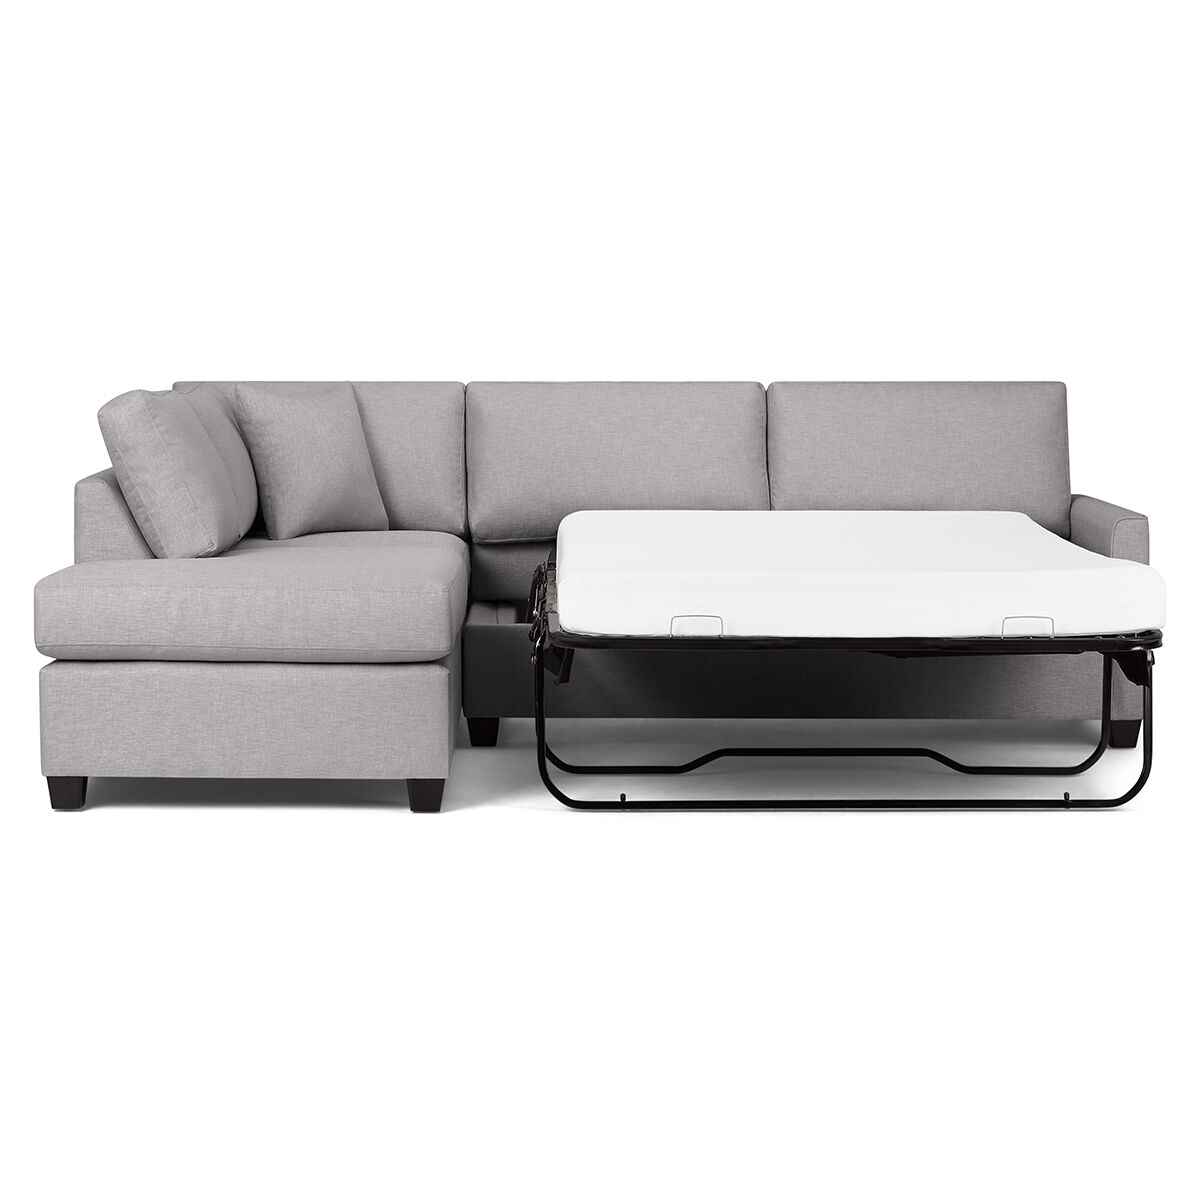 custom sectional sofa limpeza de em santa barbara d oeste sectionals living urban barn liberty w double bed